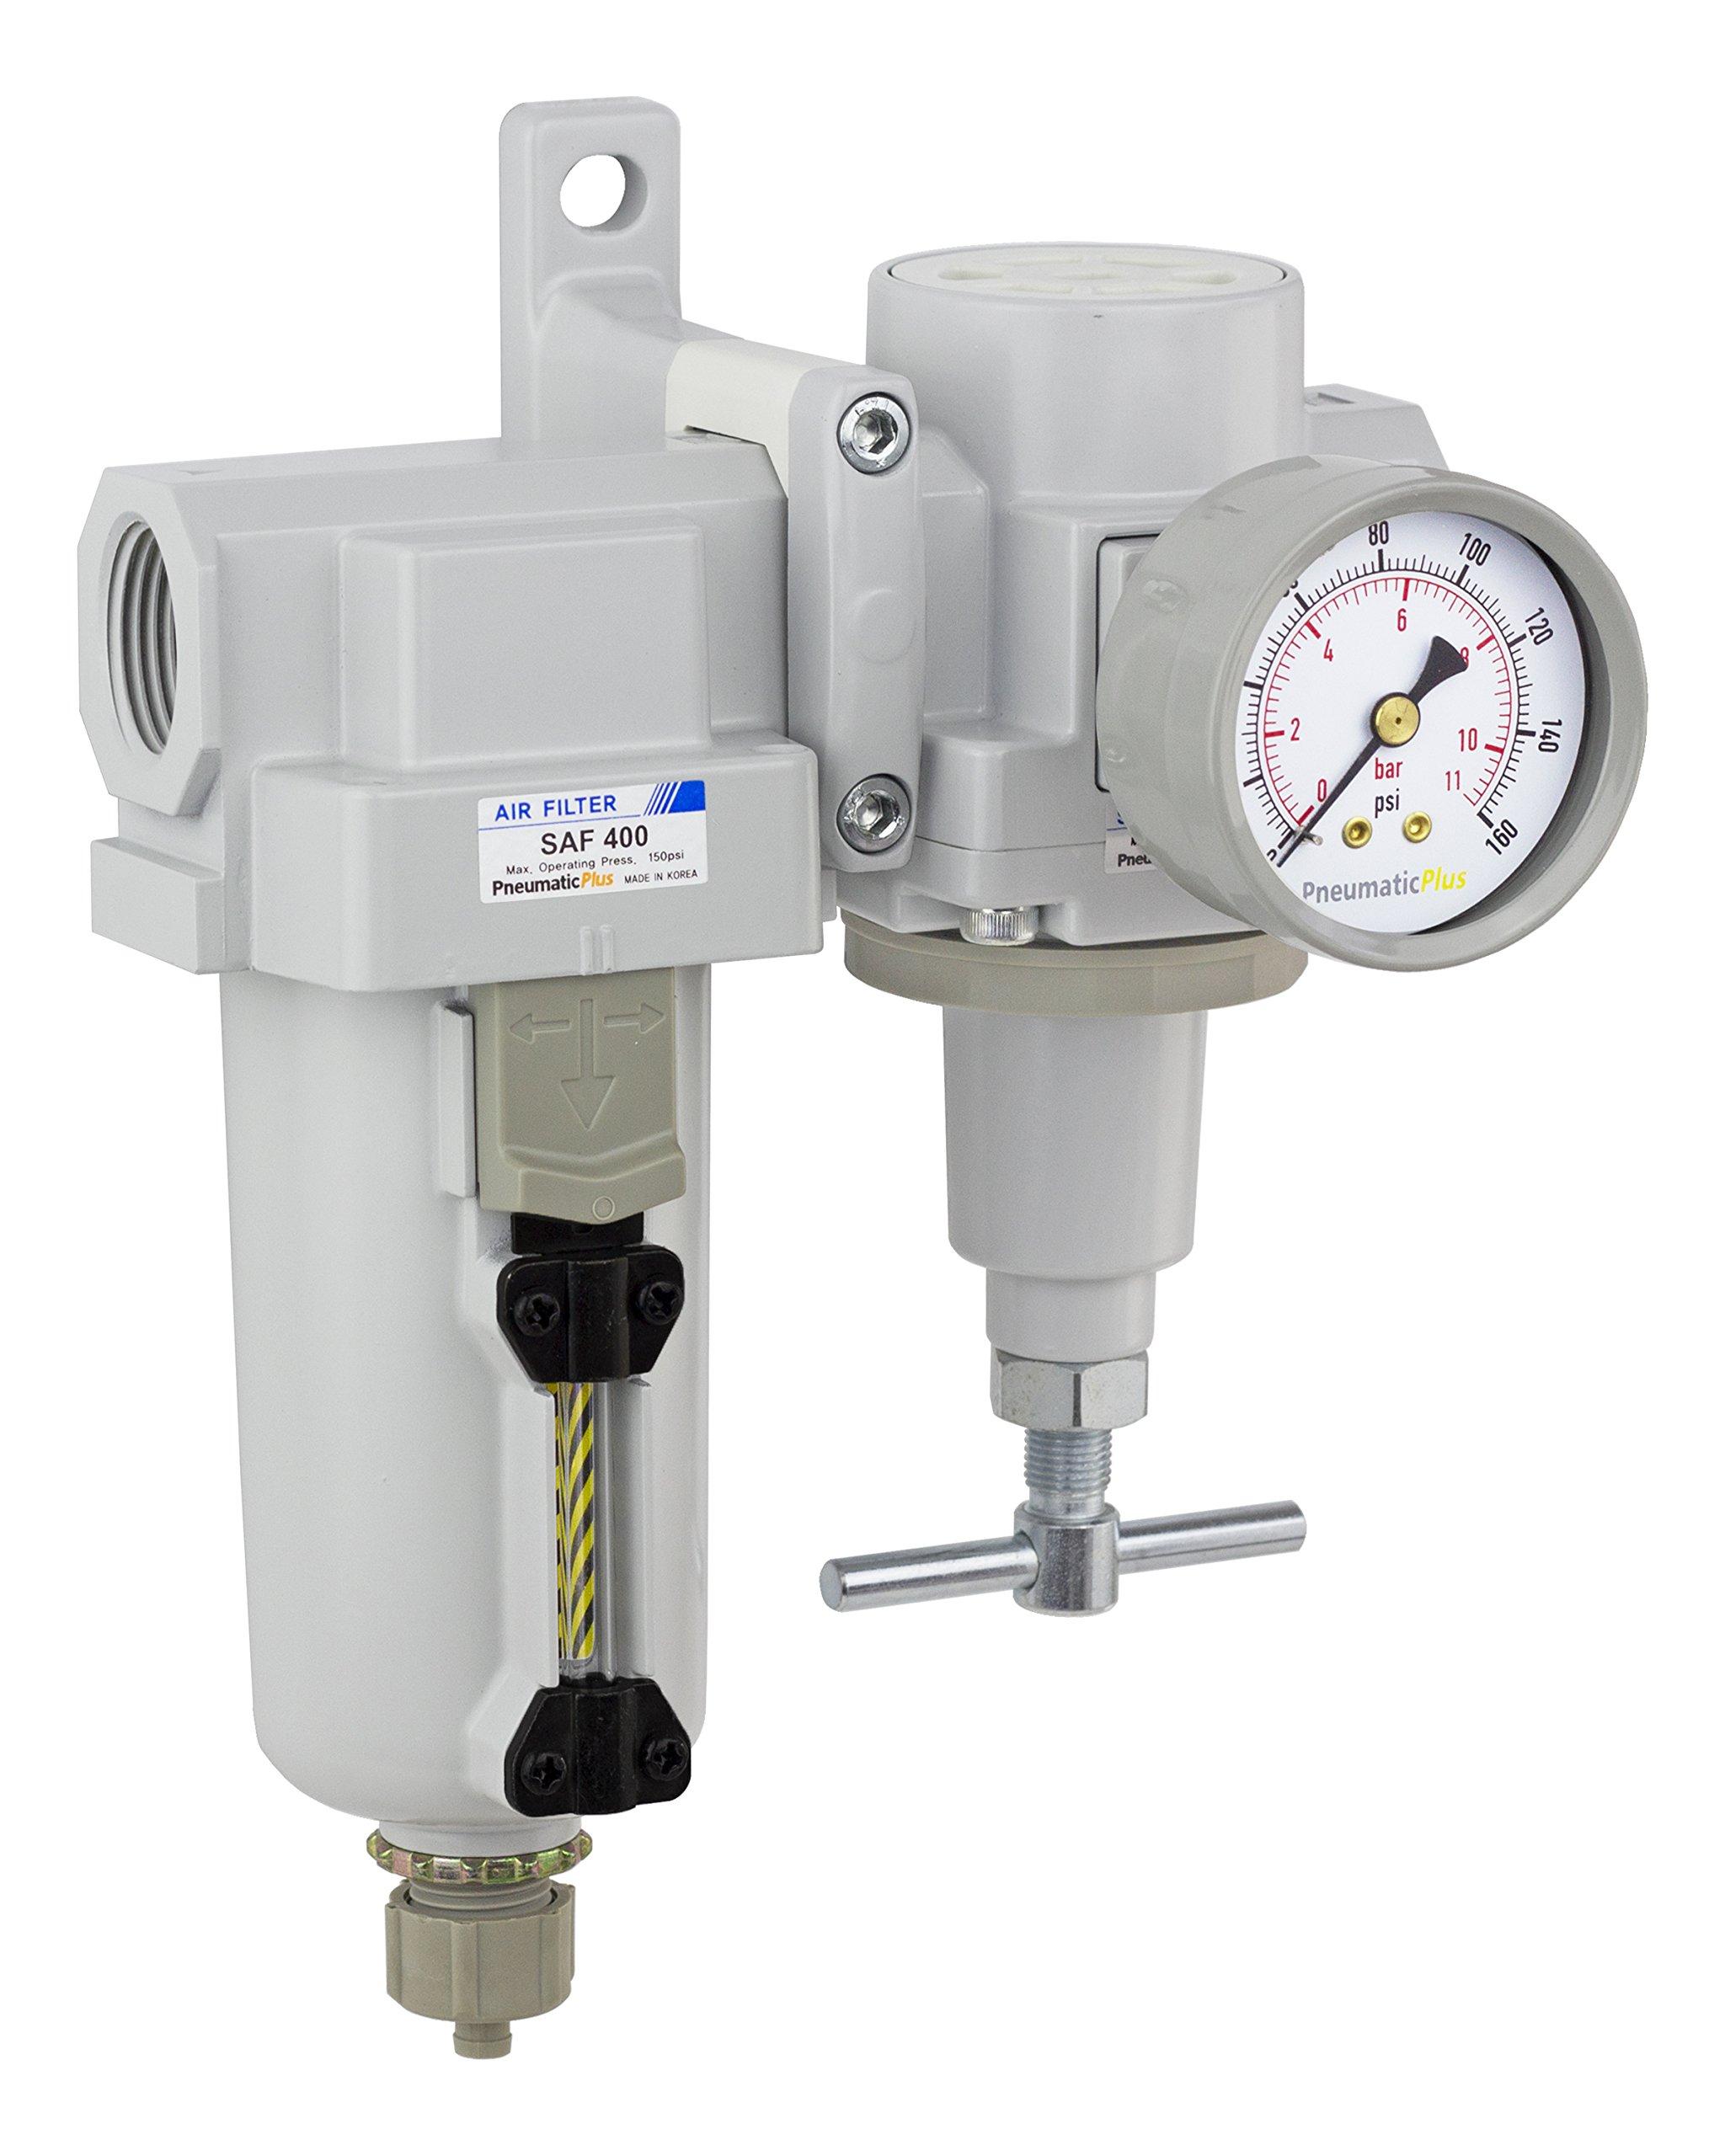 PneumaticPlus SAU420T-N06G-MEP Air Filter Regulator Combo 3/4'' NPT -T-Handle, Manual Drain, Metal Bowl by PneumaticPlus